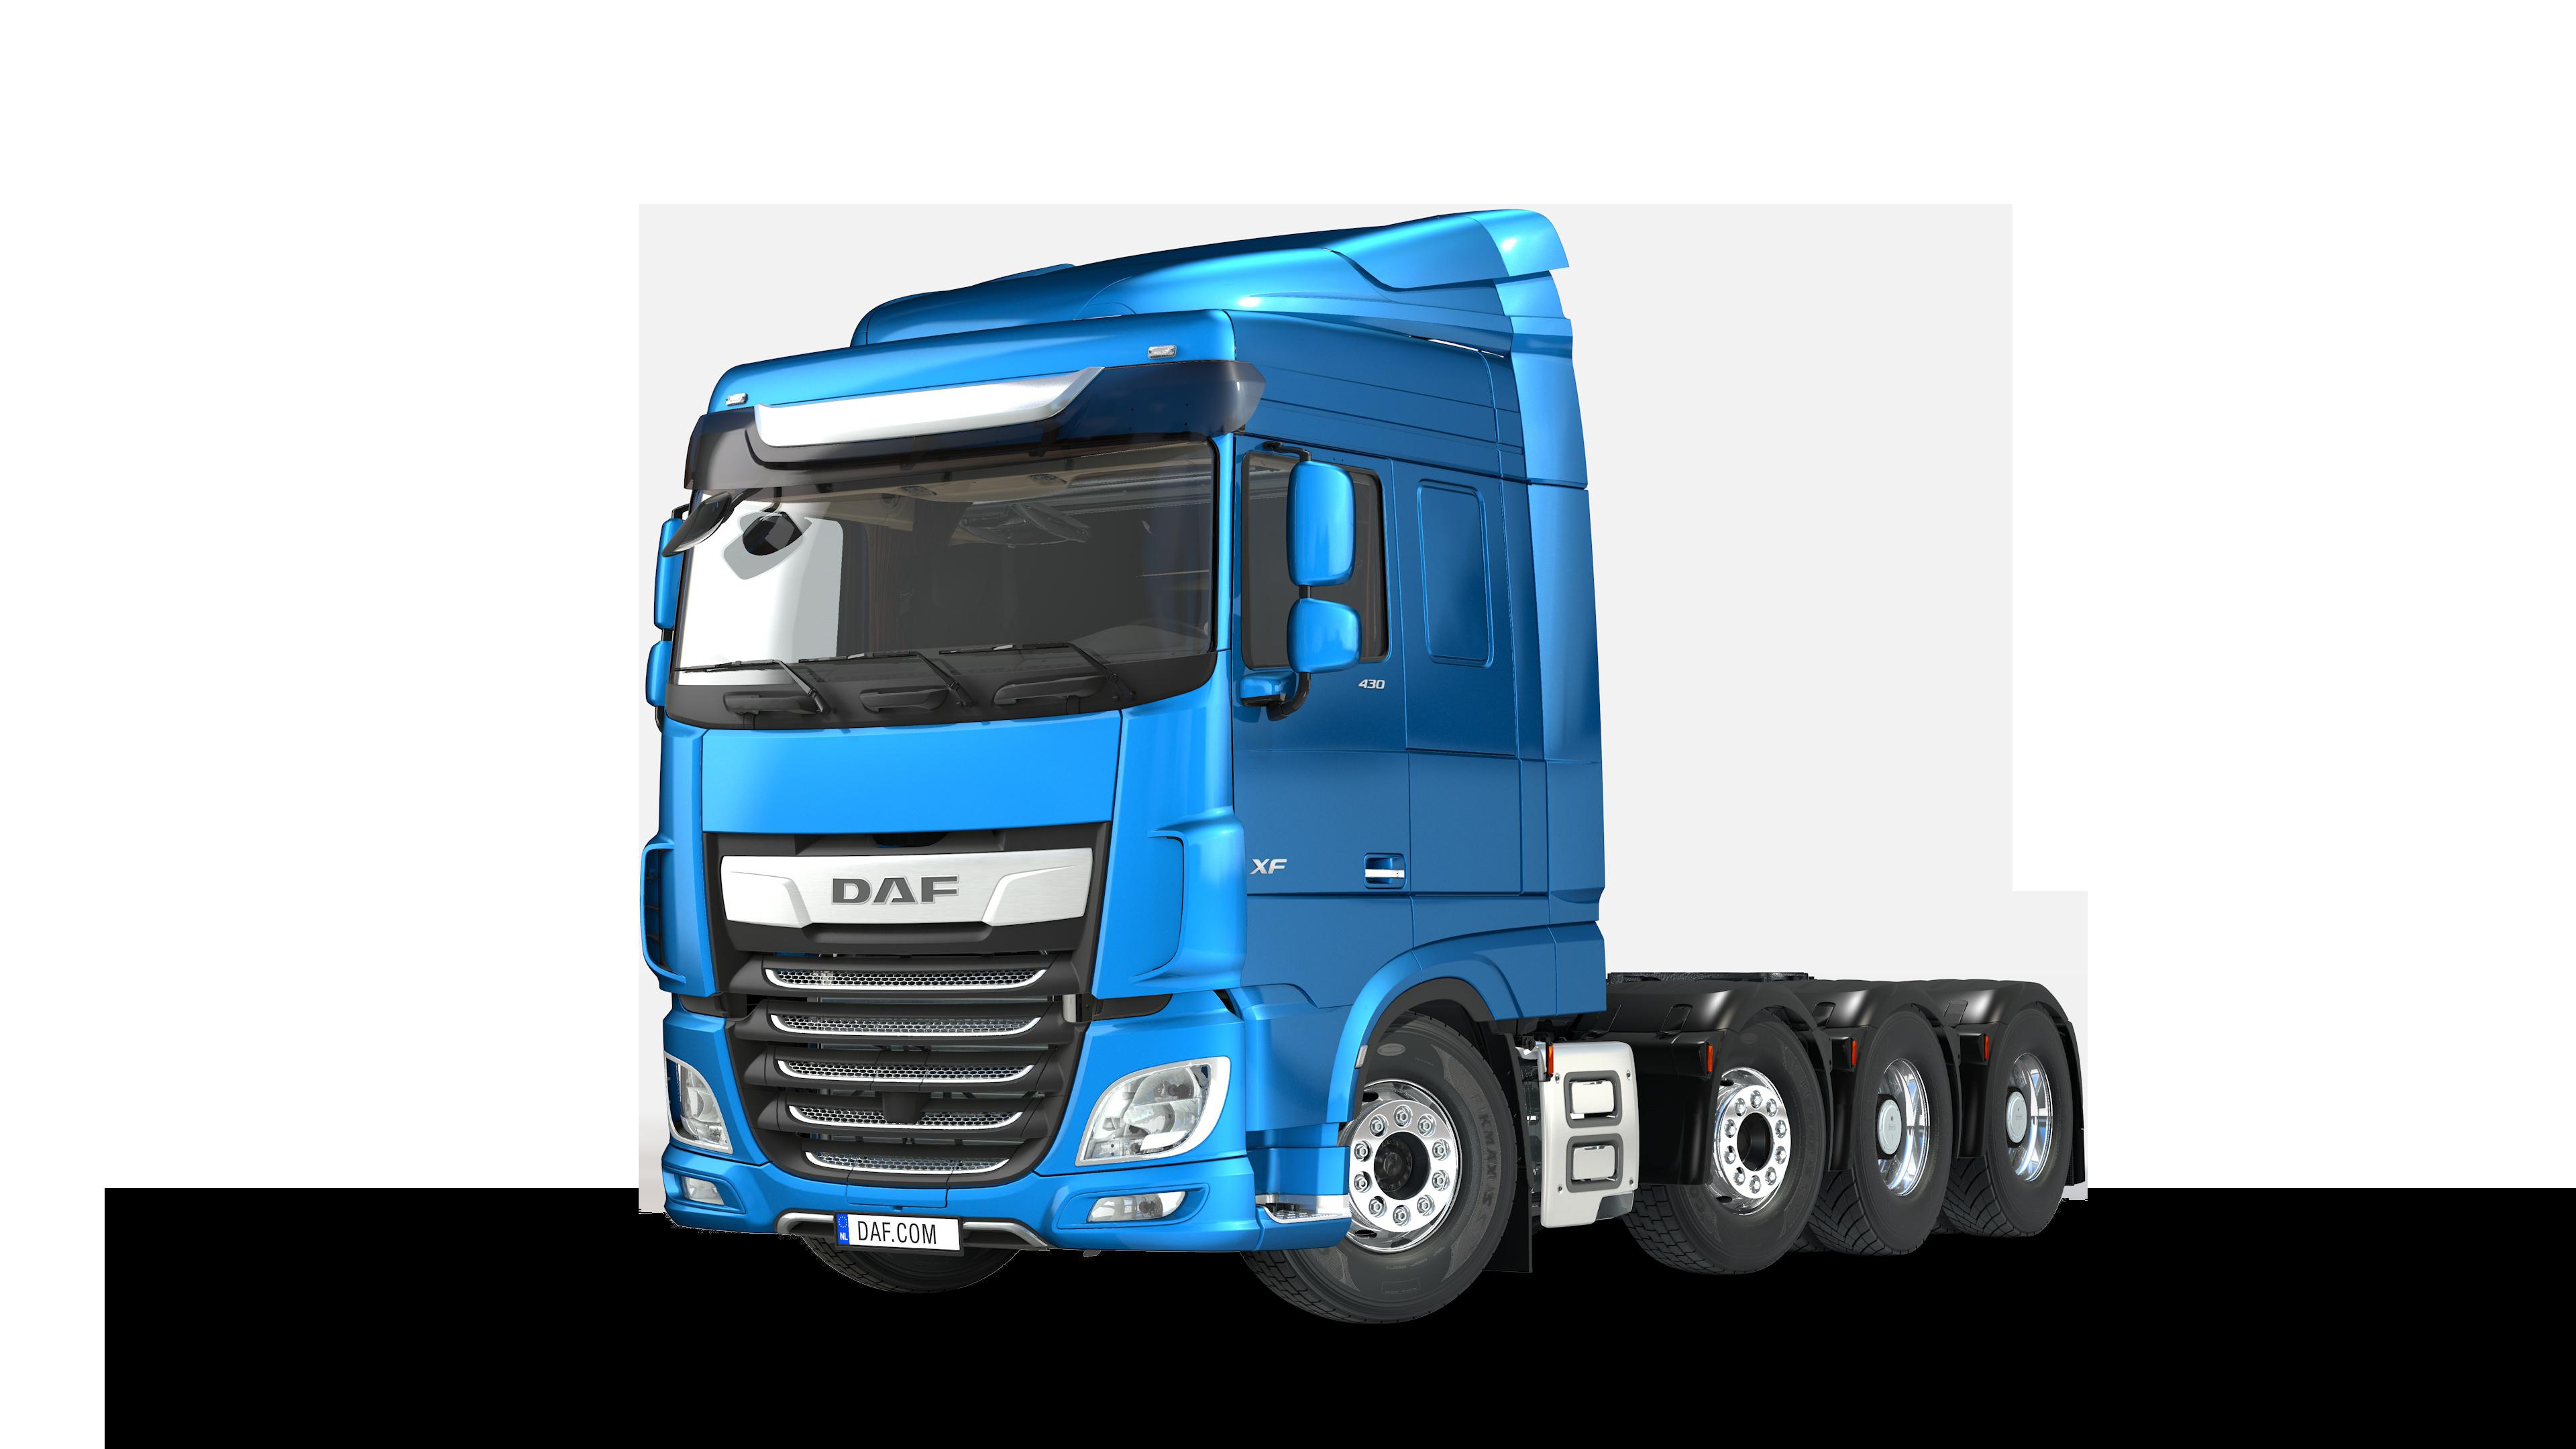 DAF Image library - DAF Corporate